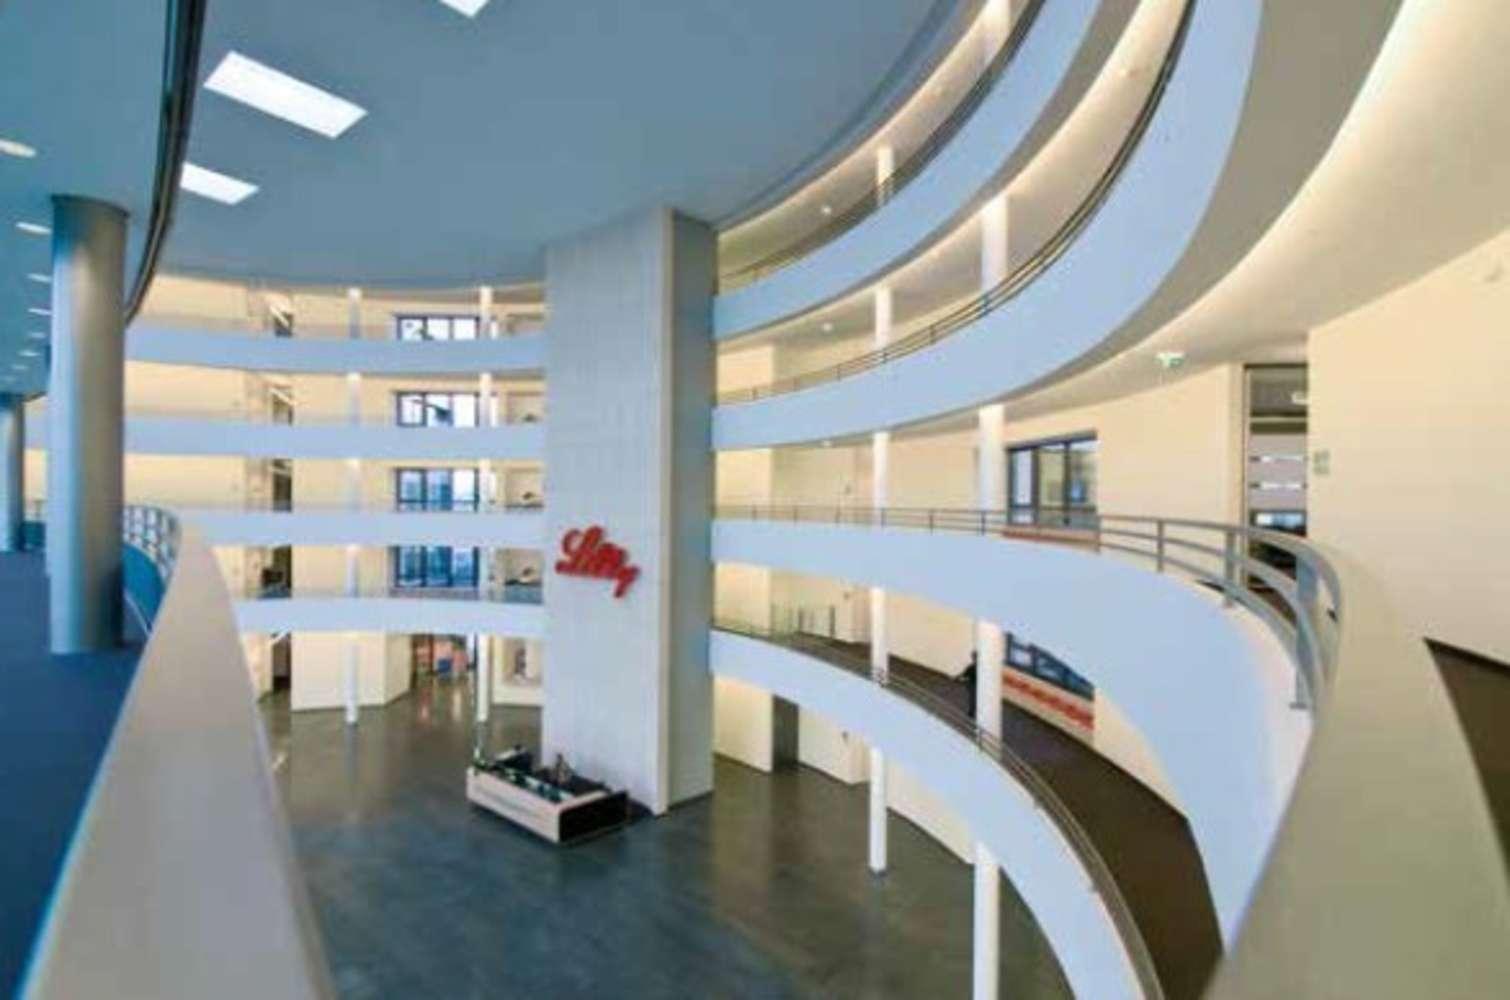 Büros Bad homburg, 61352 - Büro - Bad Homburg - F1859 - 9917273